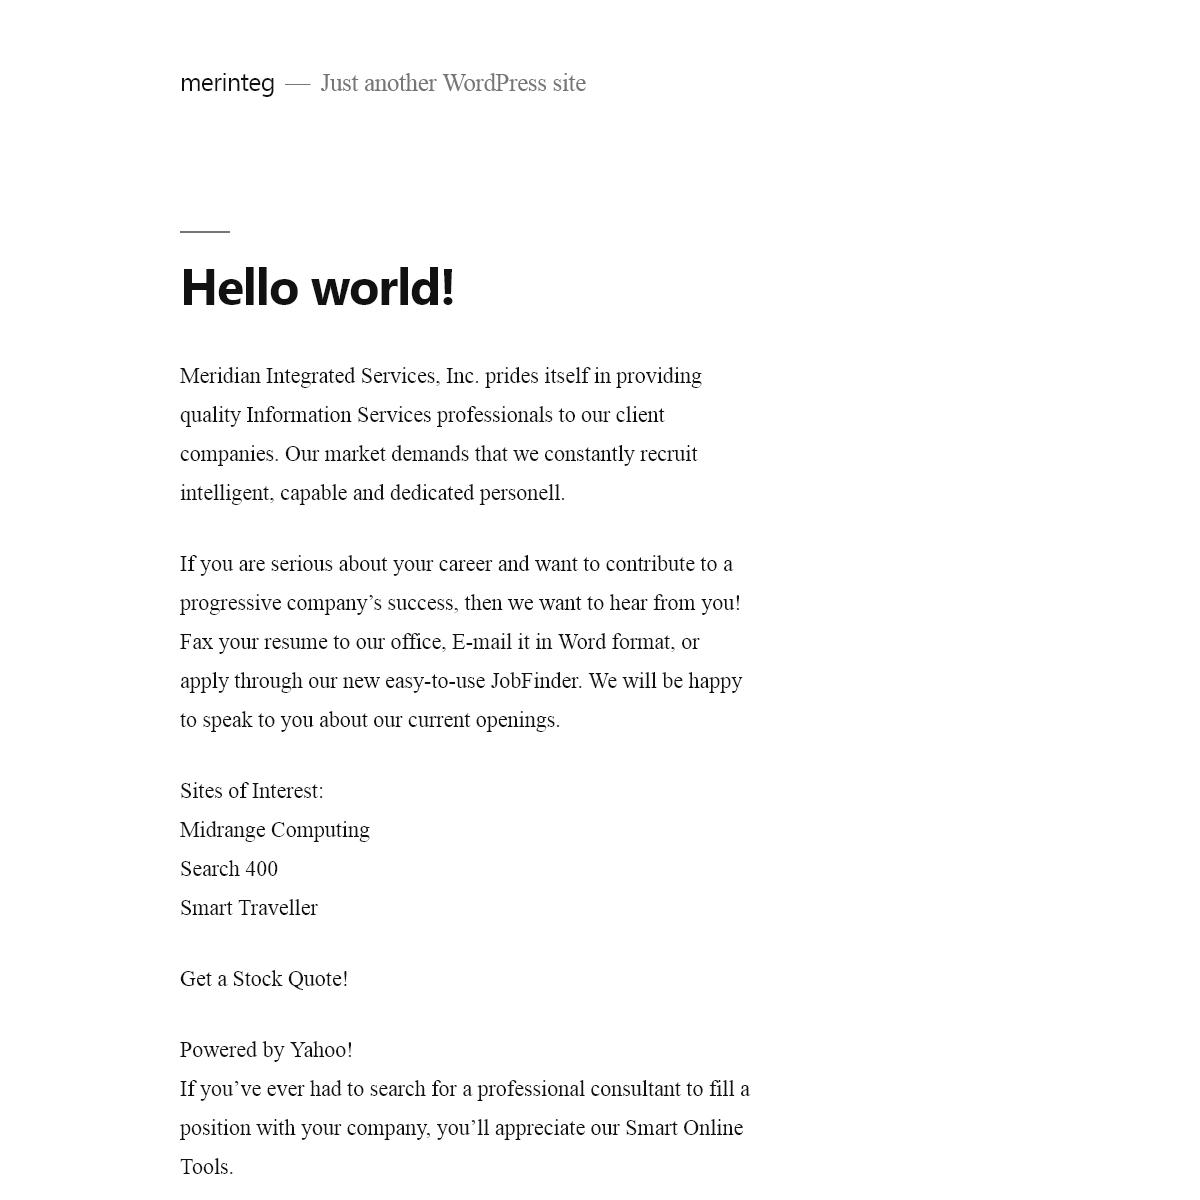 merinteg – Just another WordPress site